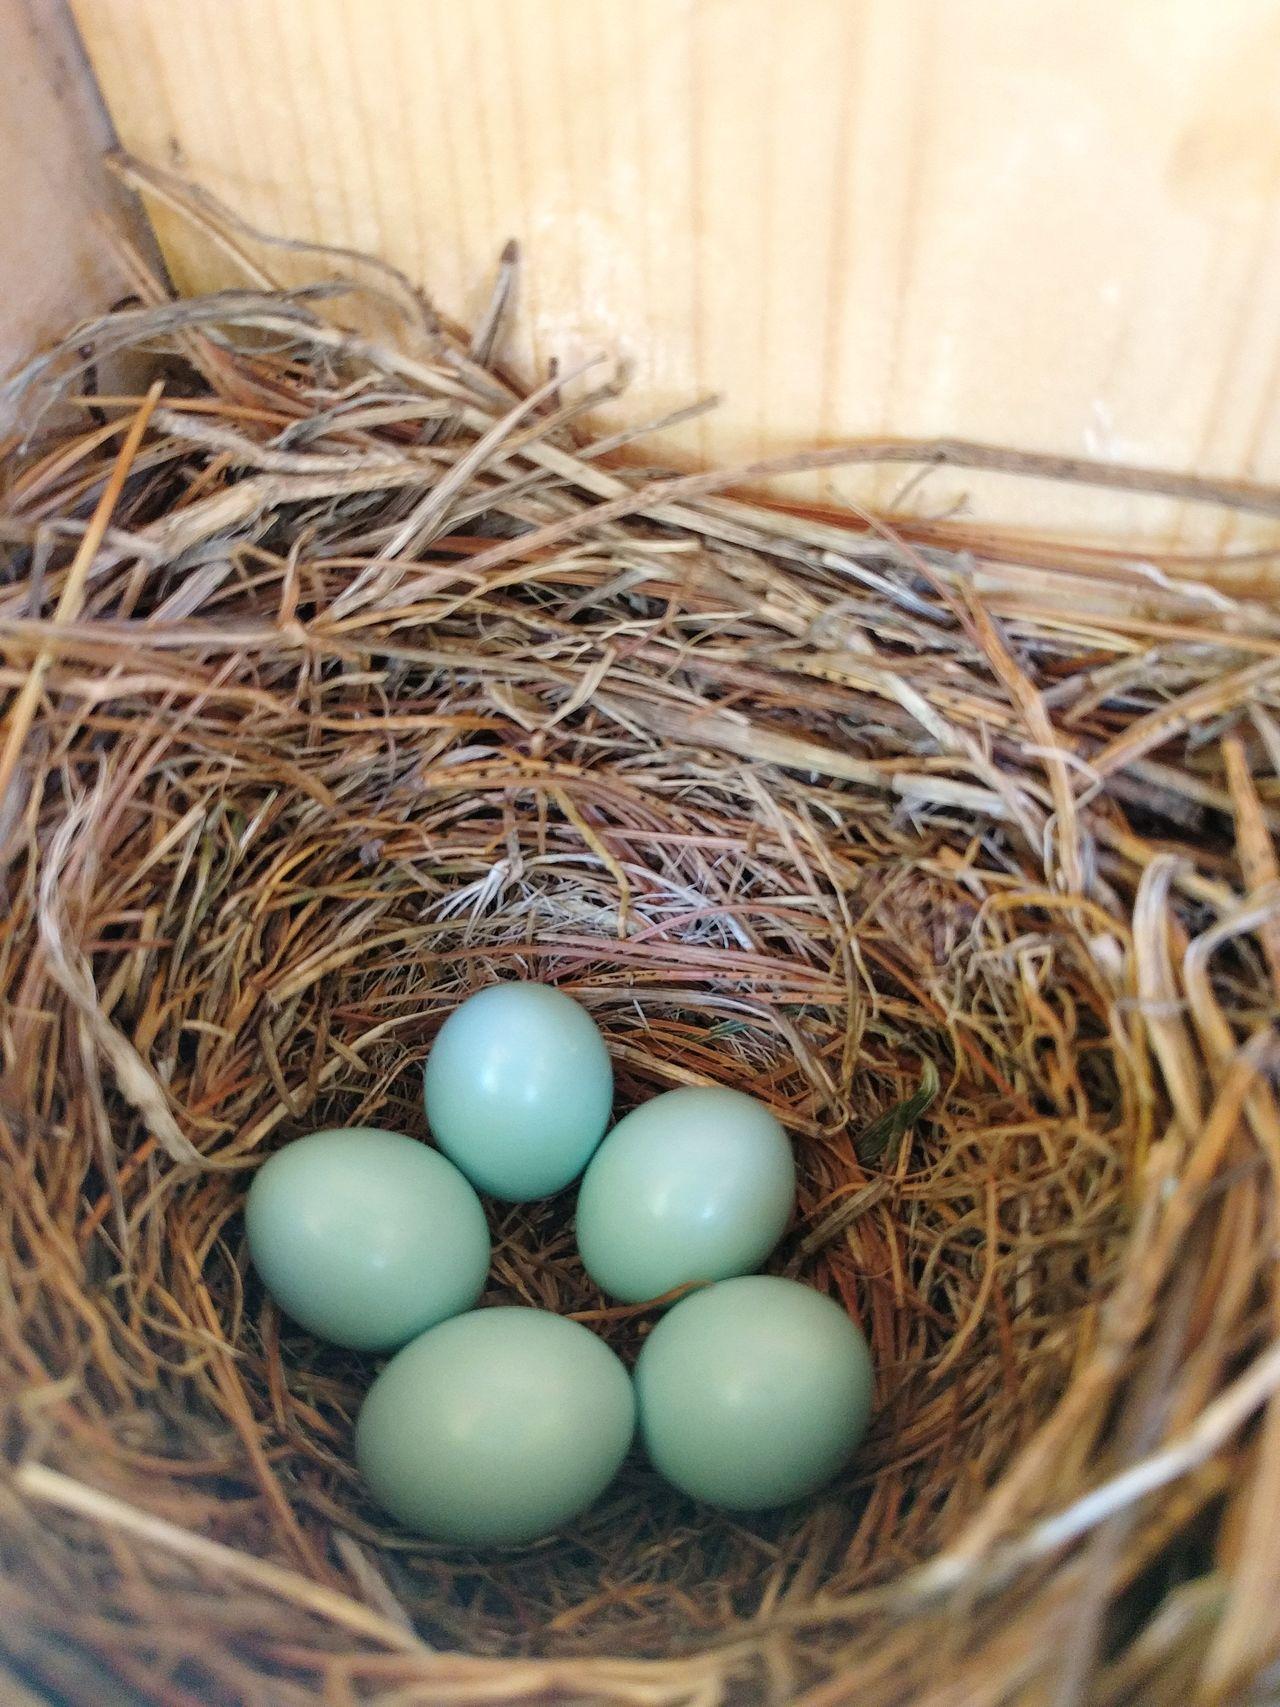 EyeEm Selects Egg Bluebird Eggs Nature Nest New Life Fragility Close-up Tolland, Connecticut